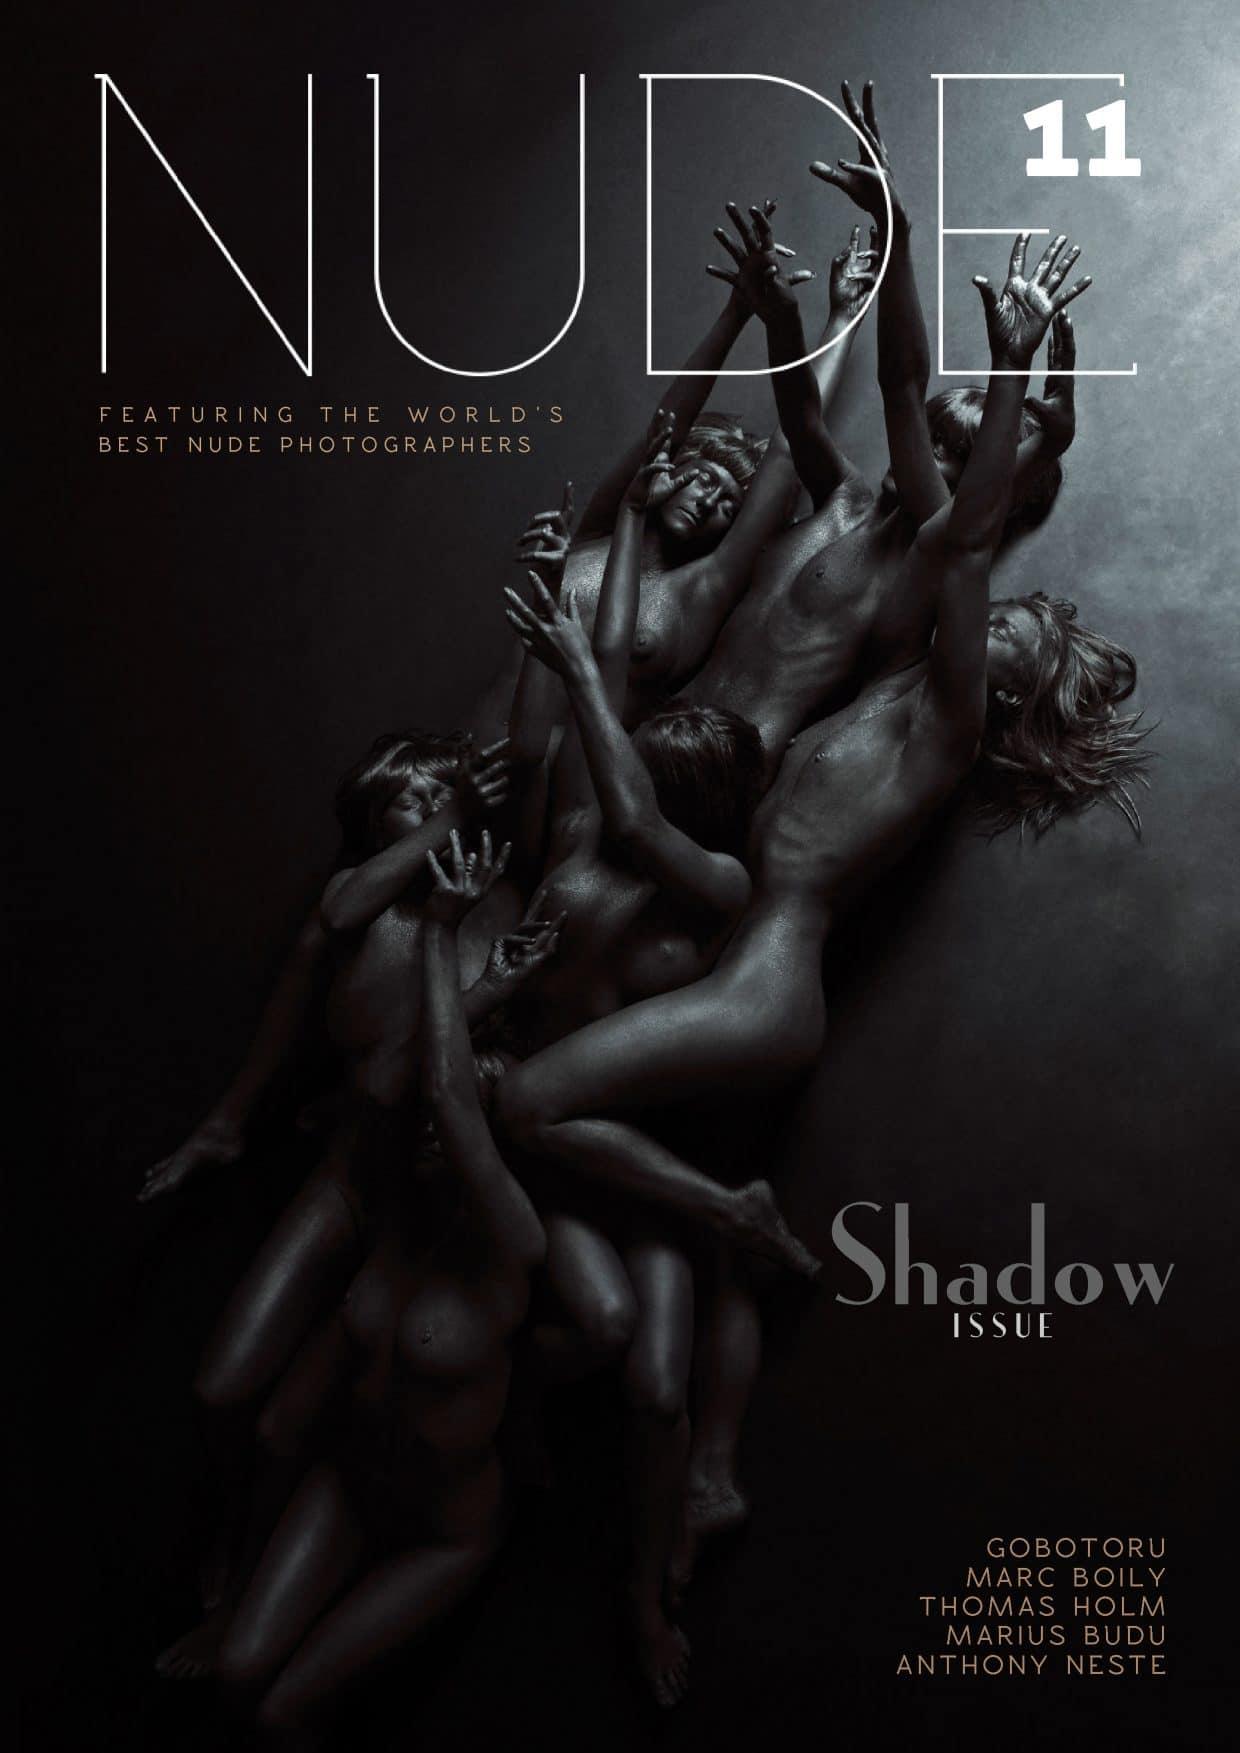 Nude Magazine - Numero 11 - Shadow Issue 1